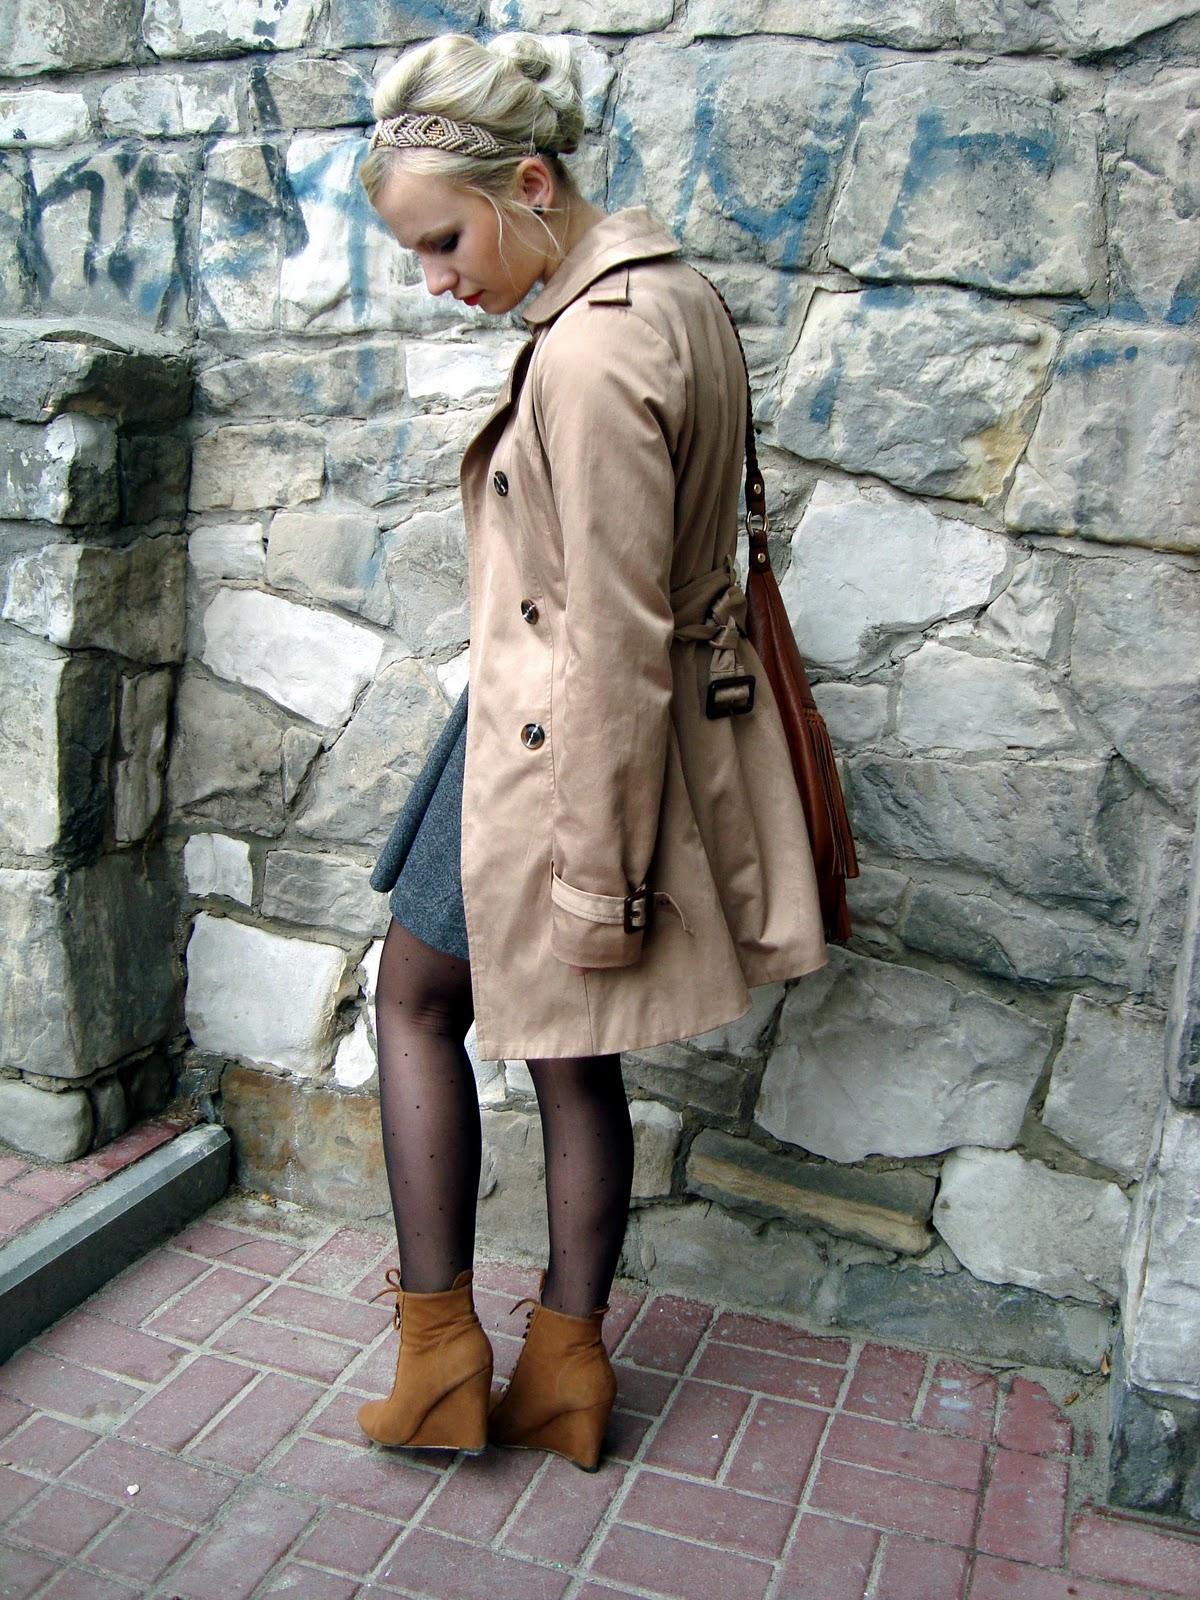 nevjuu.blogspot.co.uk - Fashionmylegs : The tights and